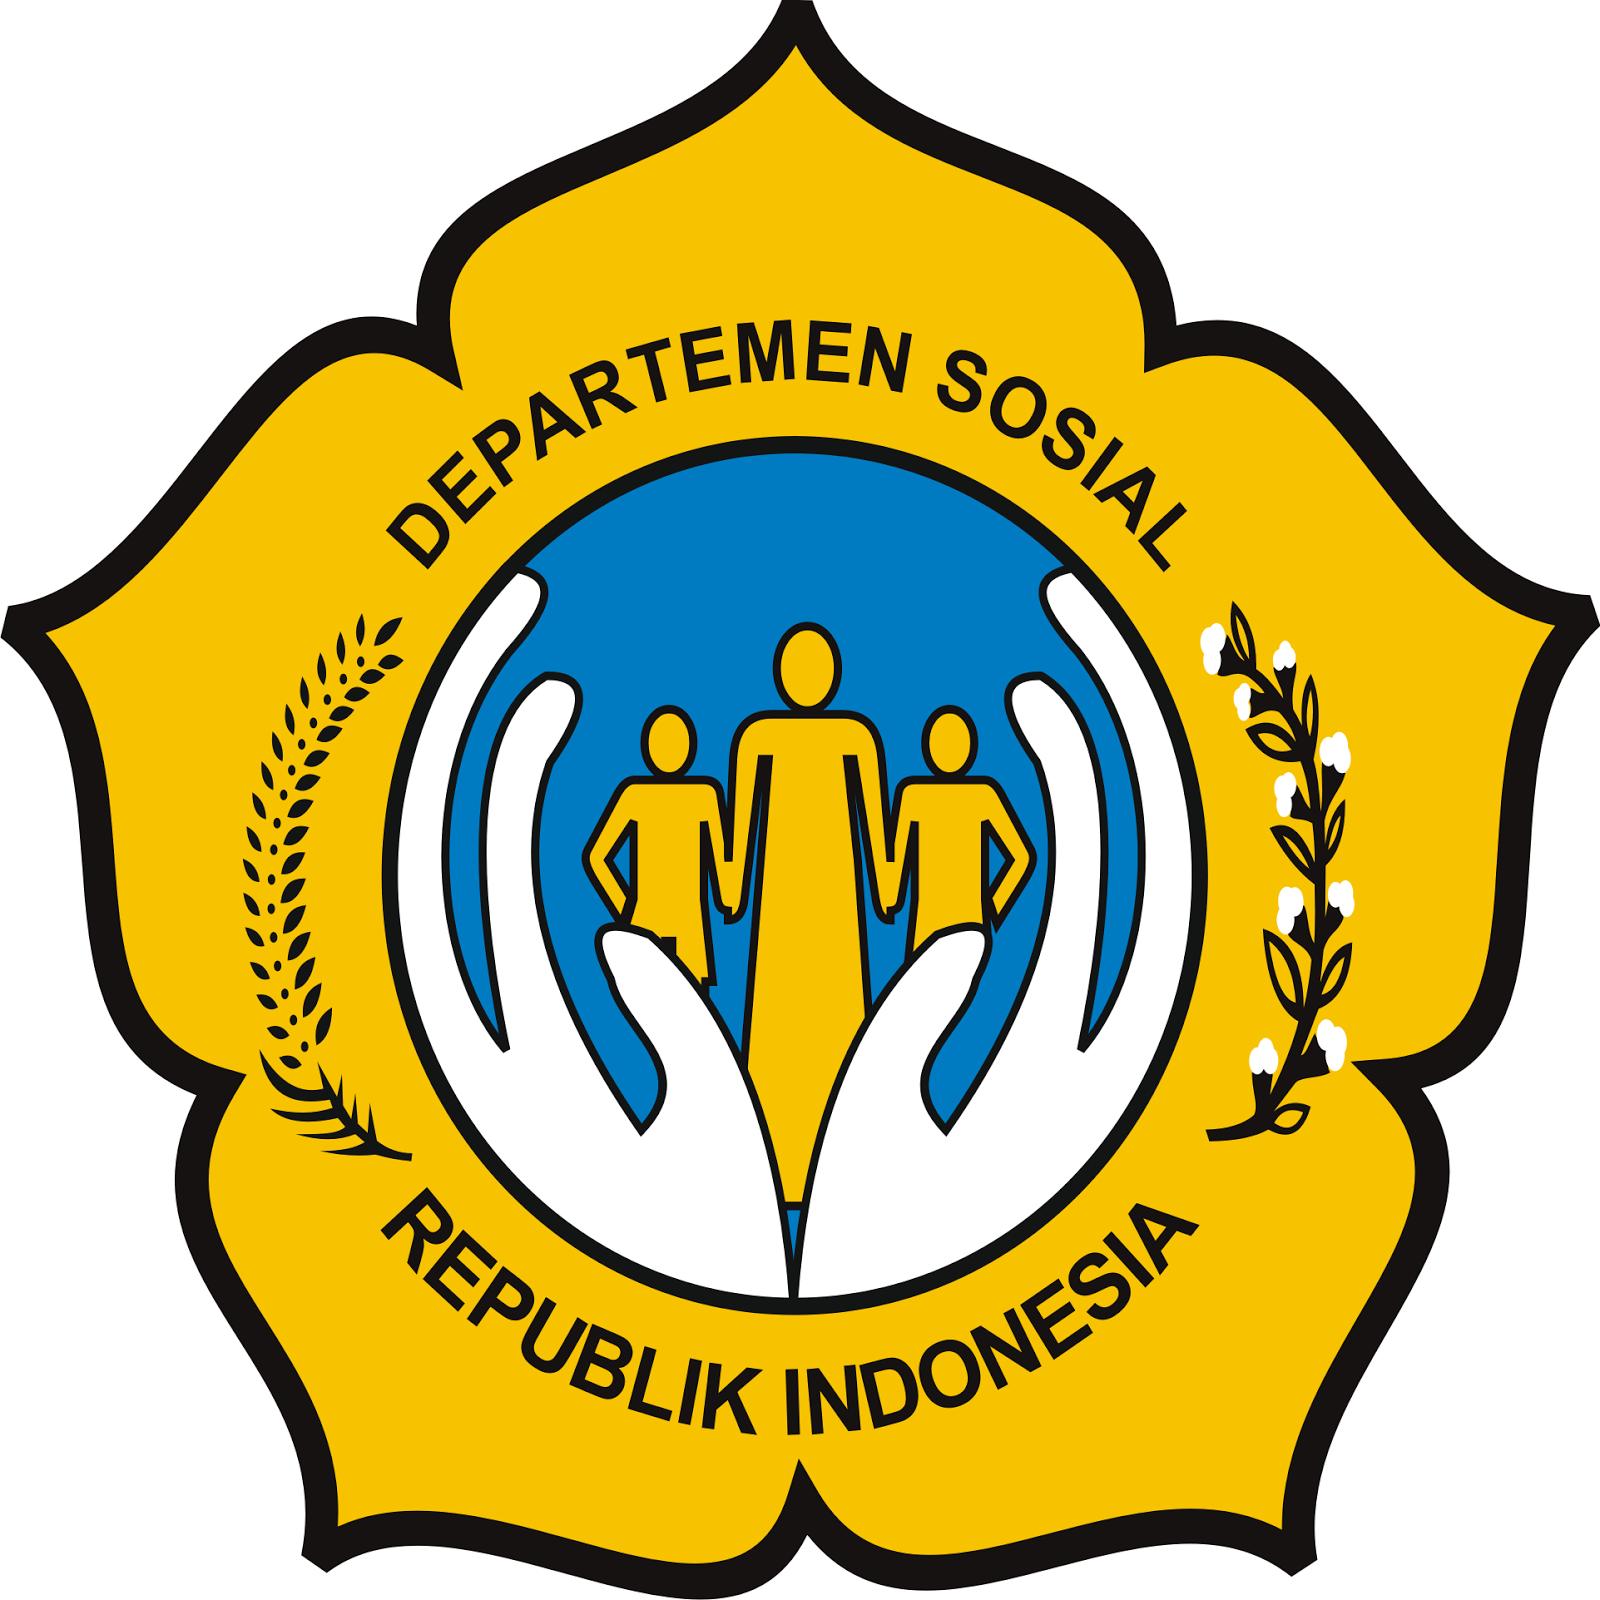 Logo Departemen Sosial Republik Indonesia (DEPSOS